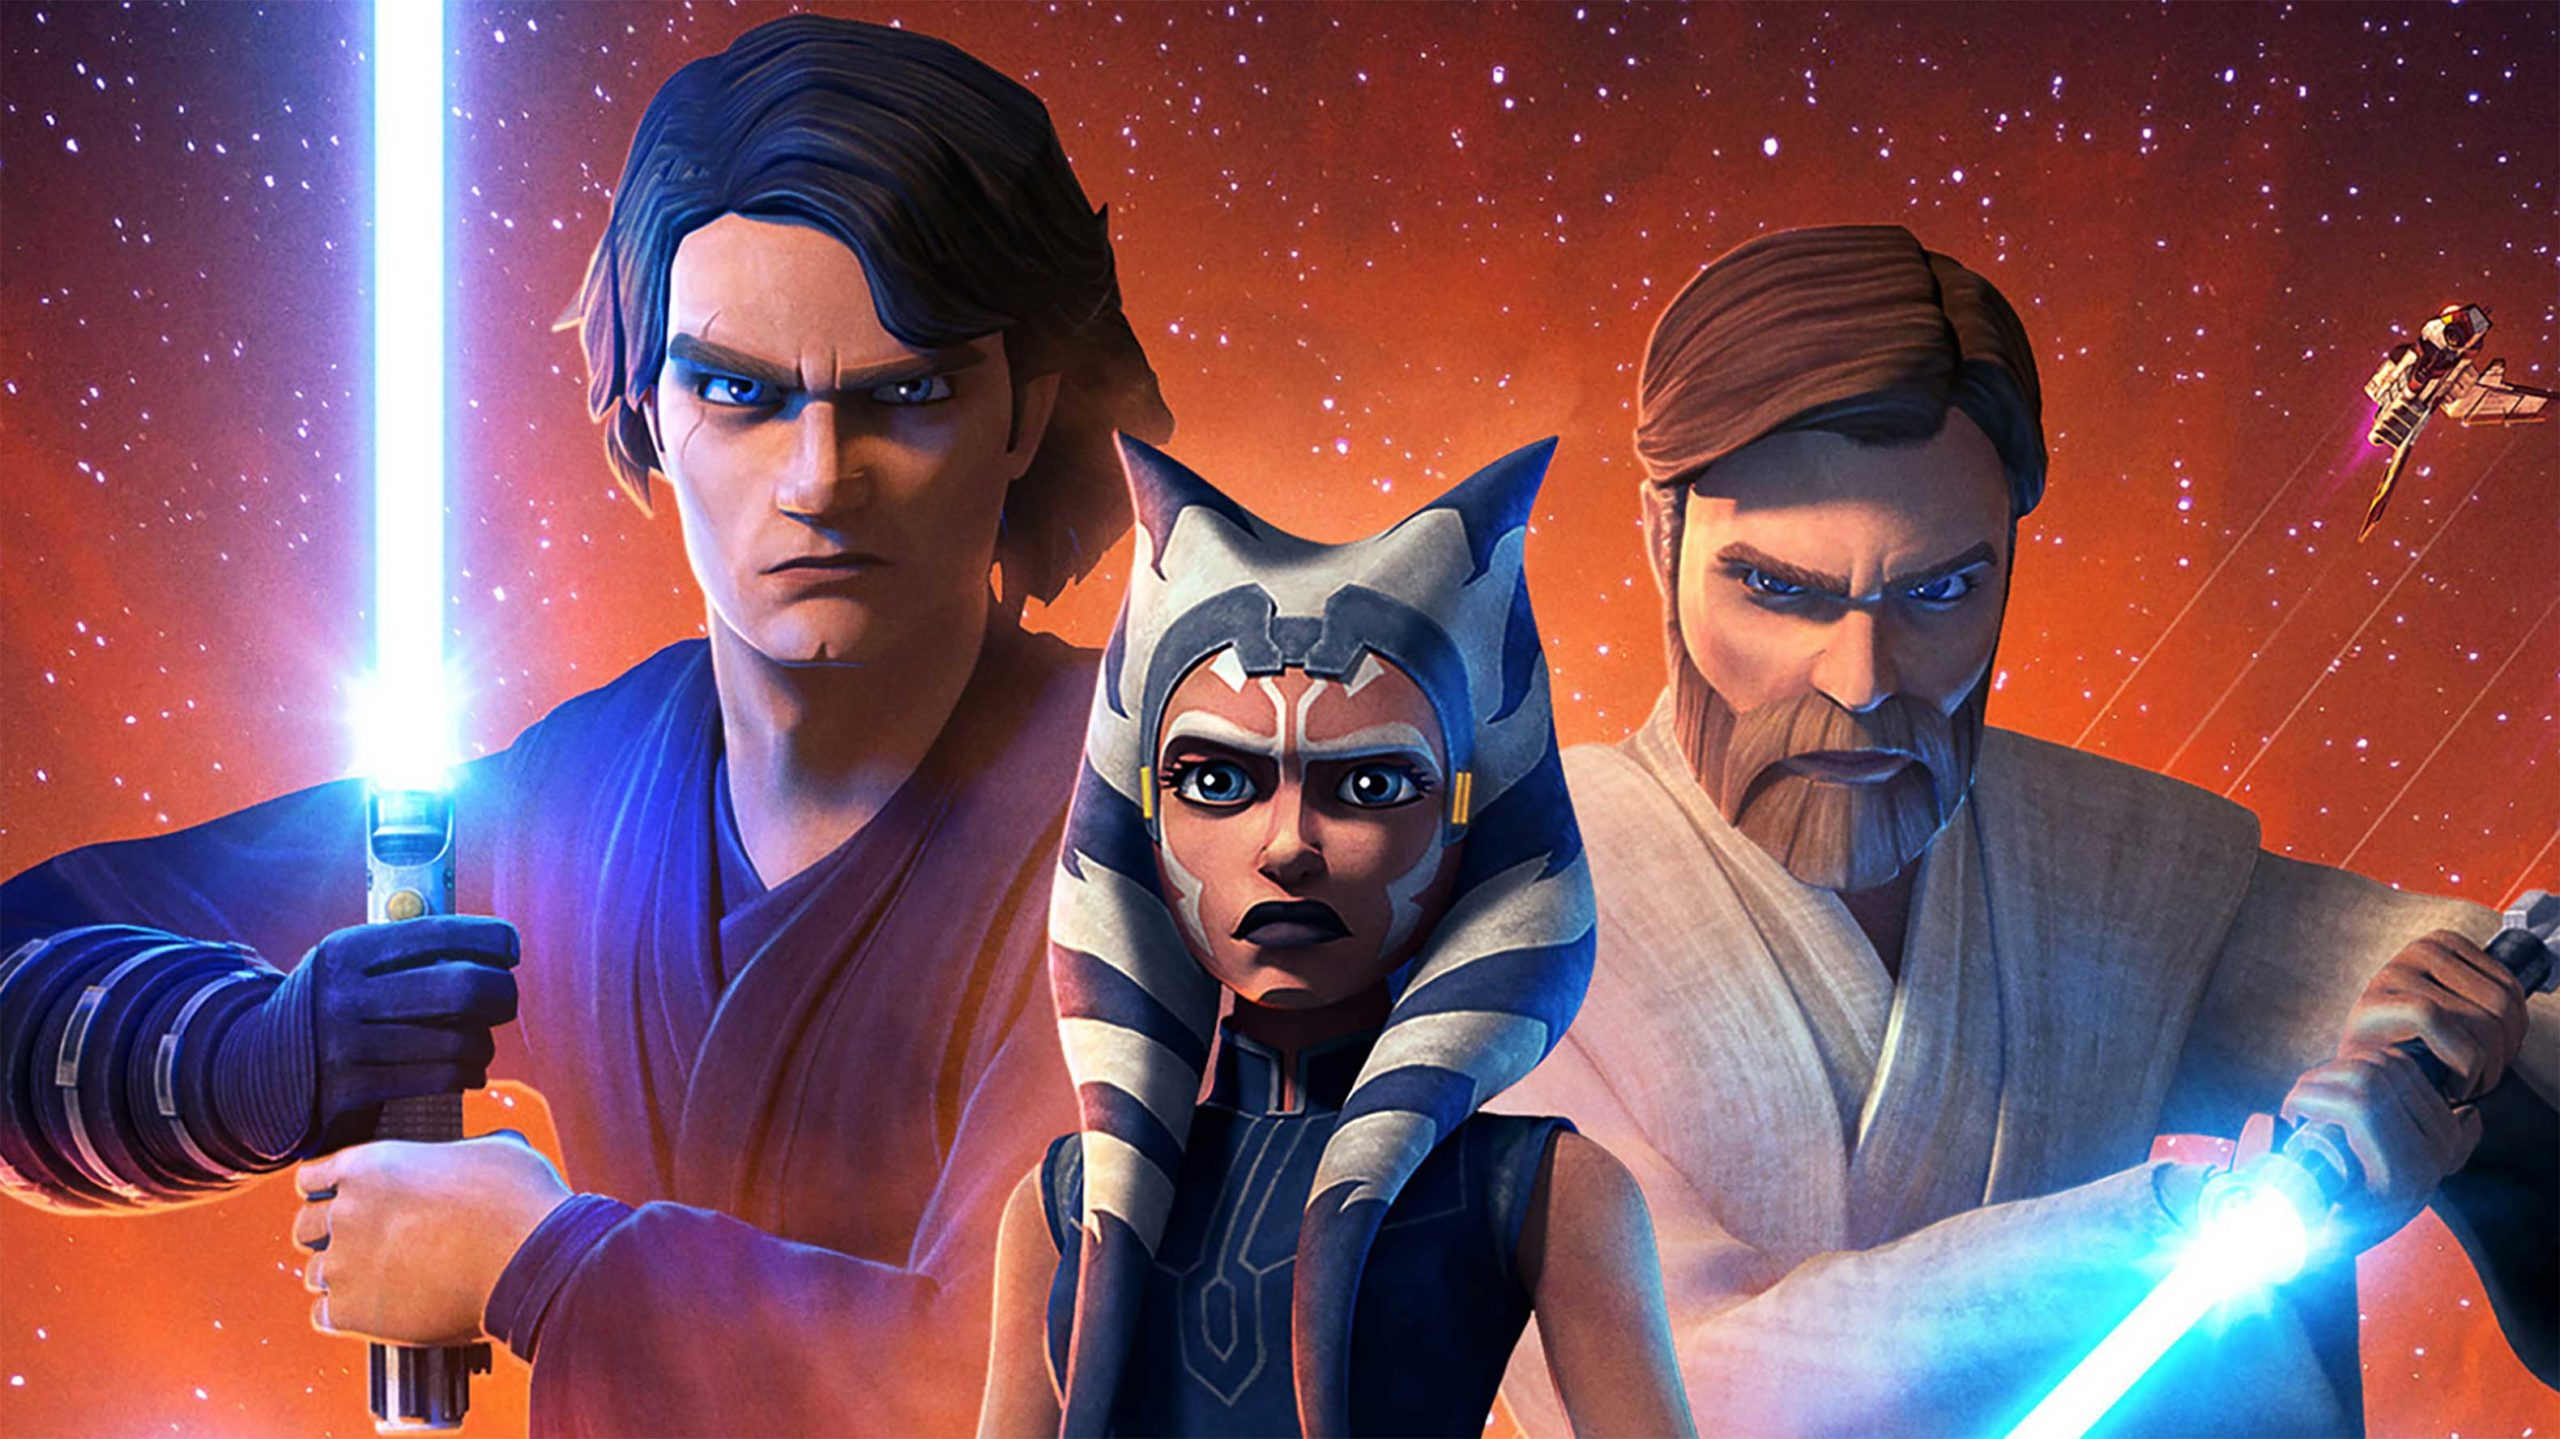 Star Wars: The Clone Wars final season